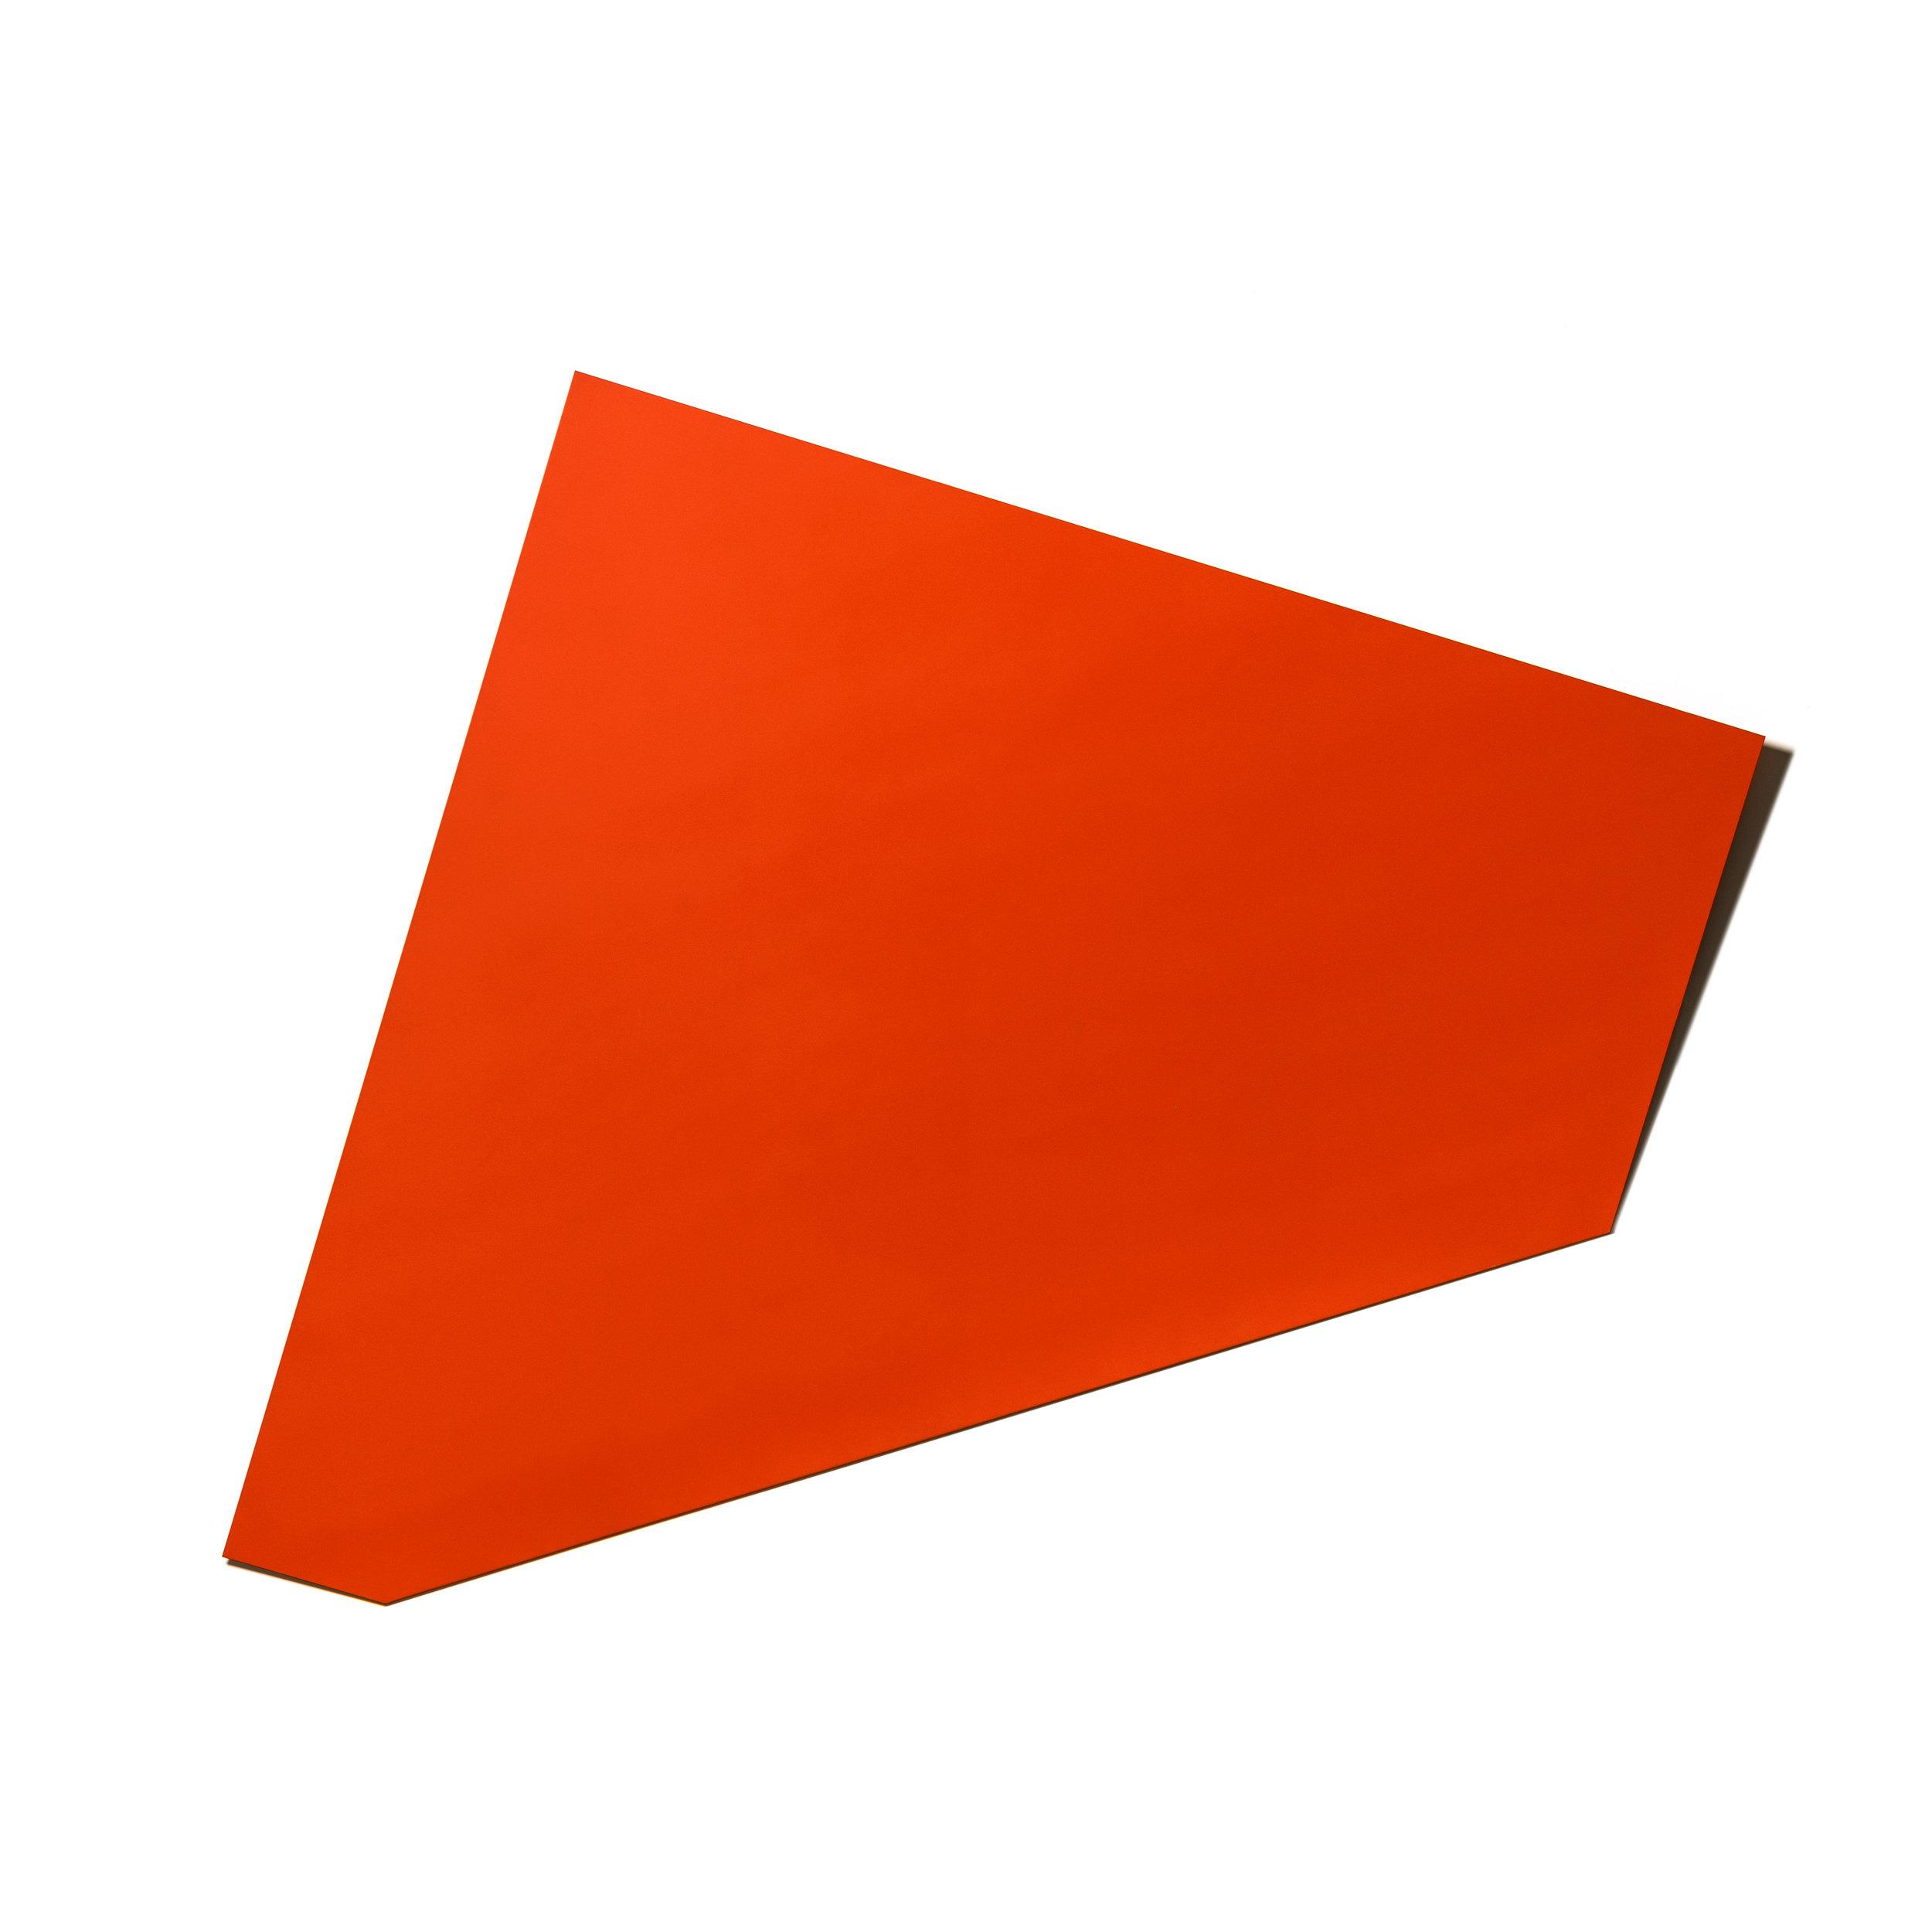 XL FOLDED FLAT RED 01 S-1137 a.jpg